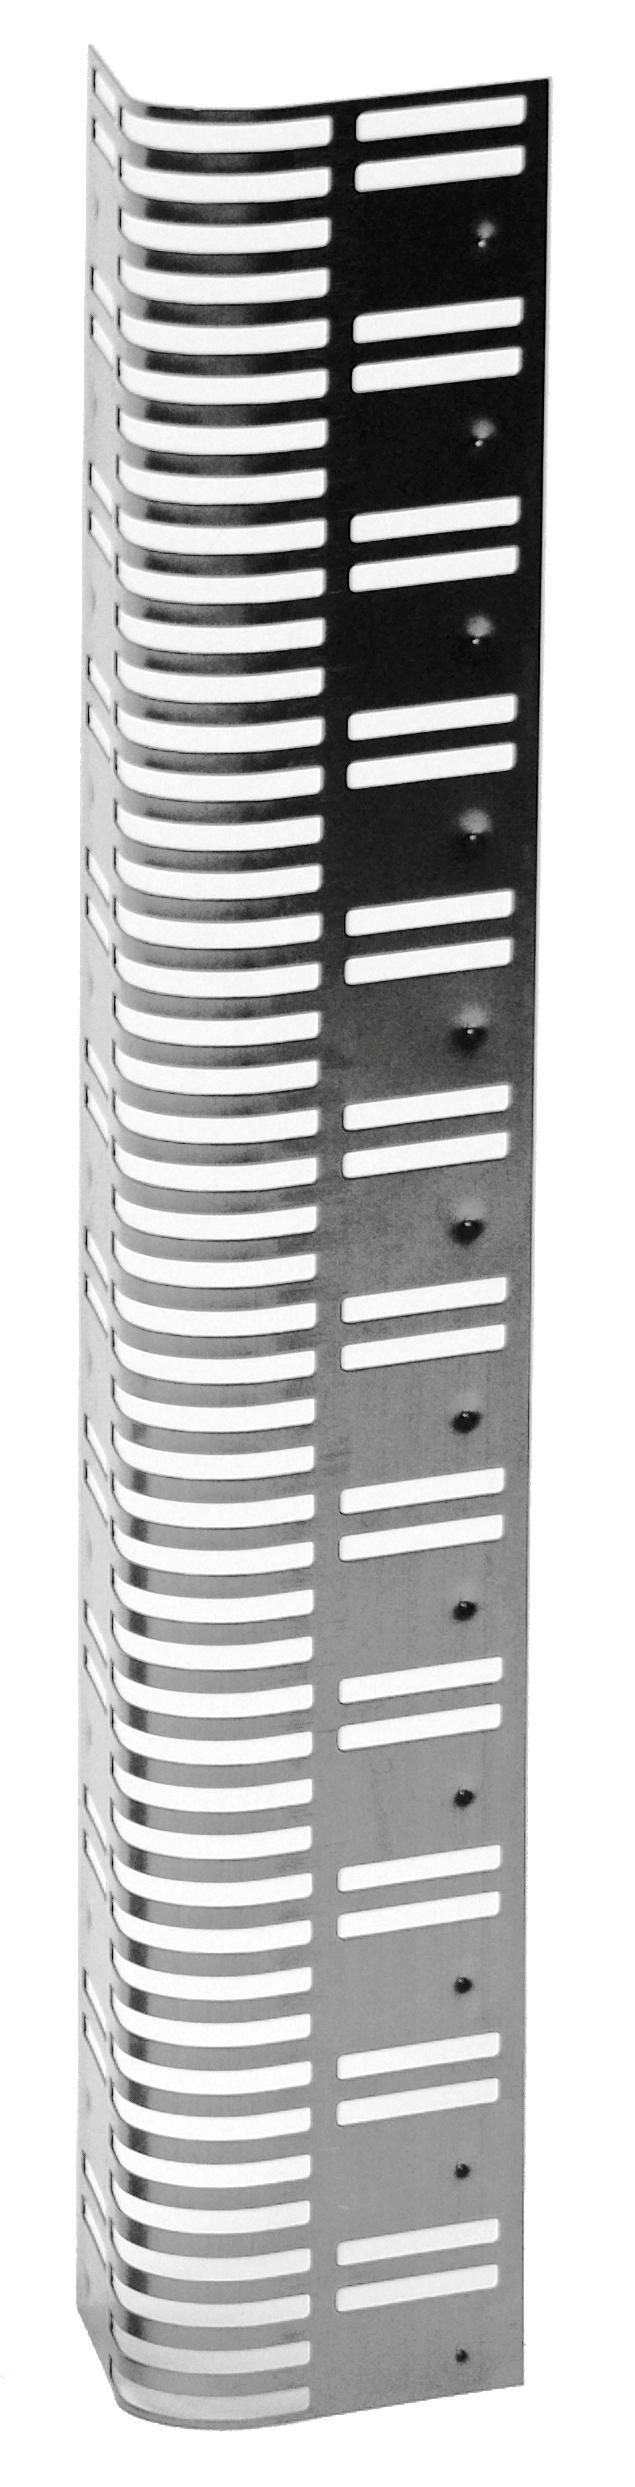 SpouwSafe 24 cm